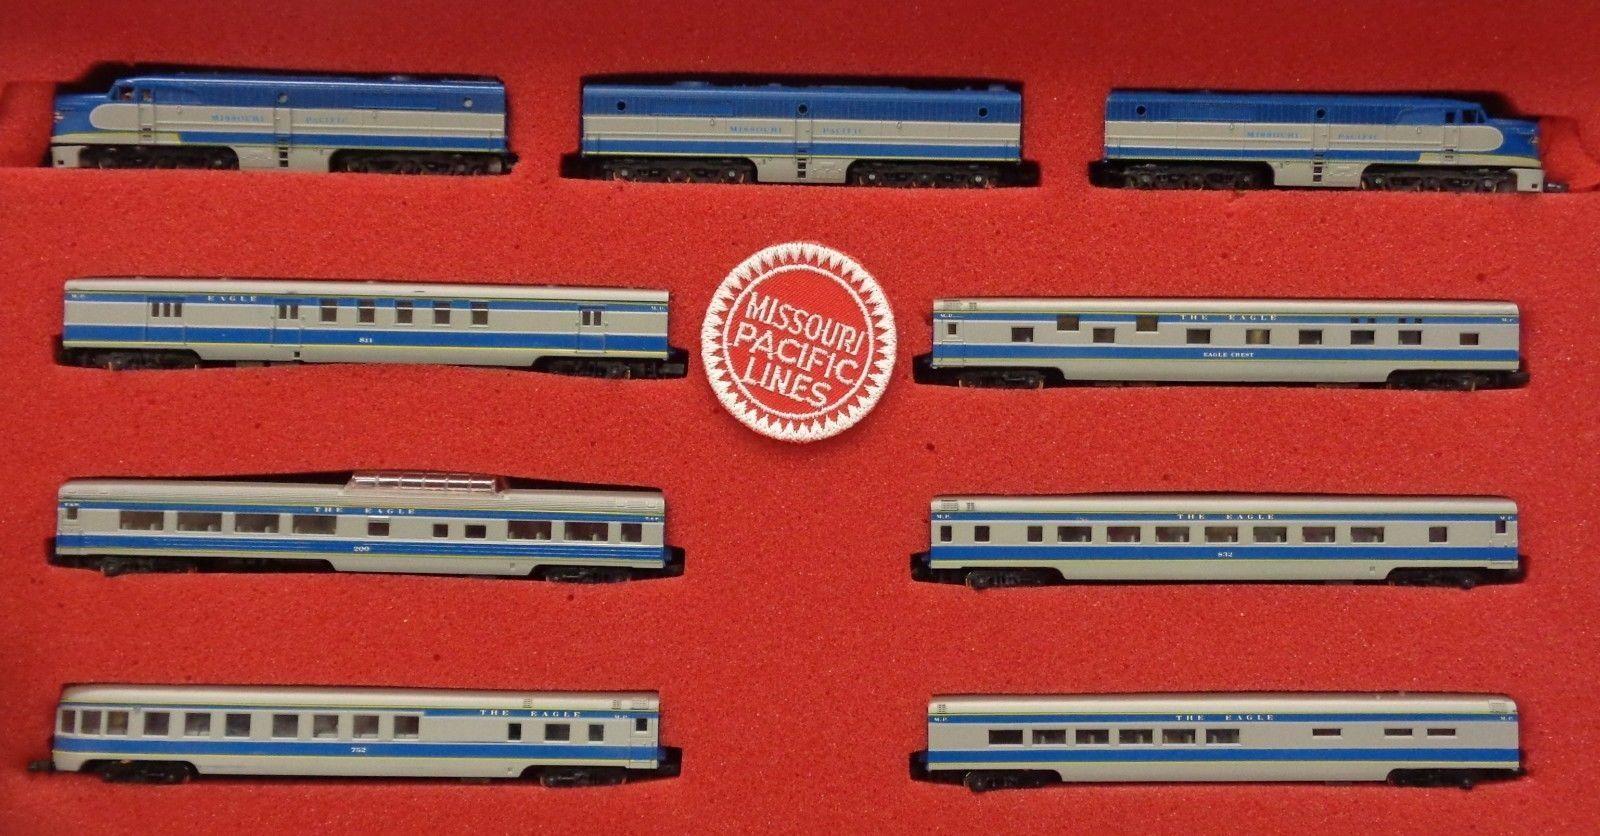 N Scale - Con-Cor - Limited Edition Set # 7 - Passenger Train, Diesel, North American, Transition Era - Missouri Pacific - 9-Unit